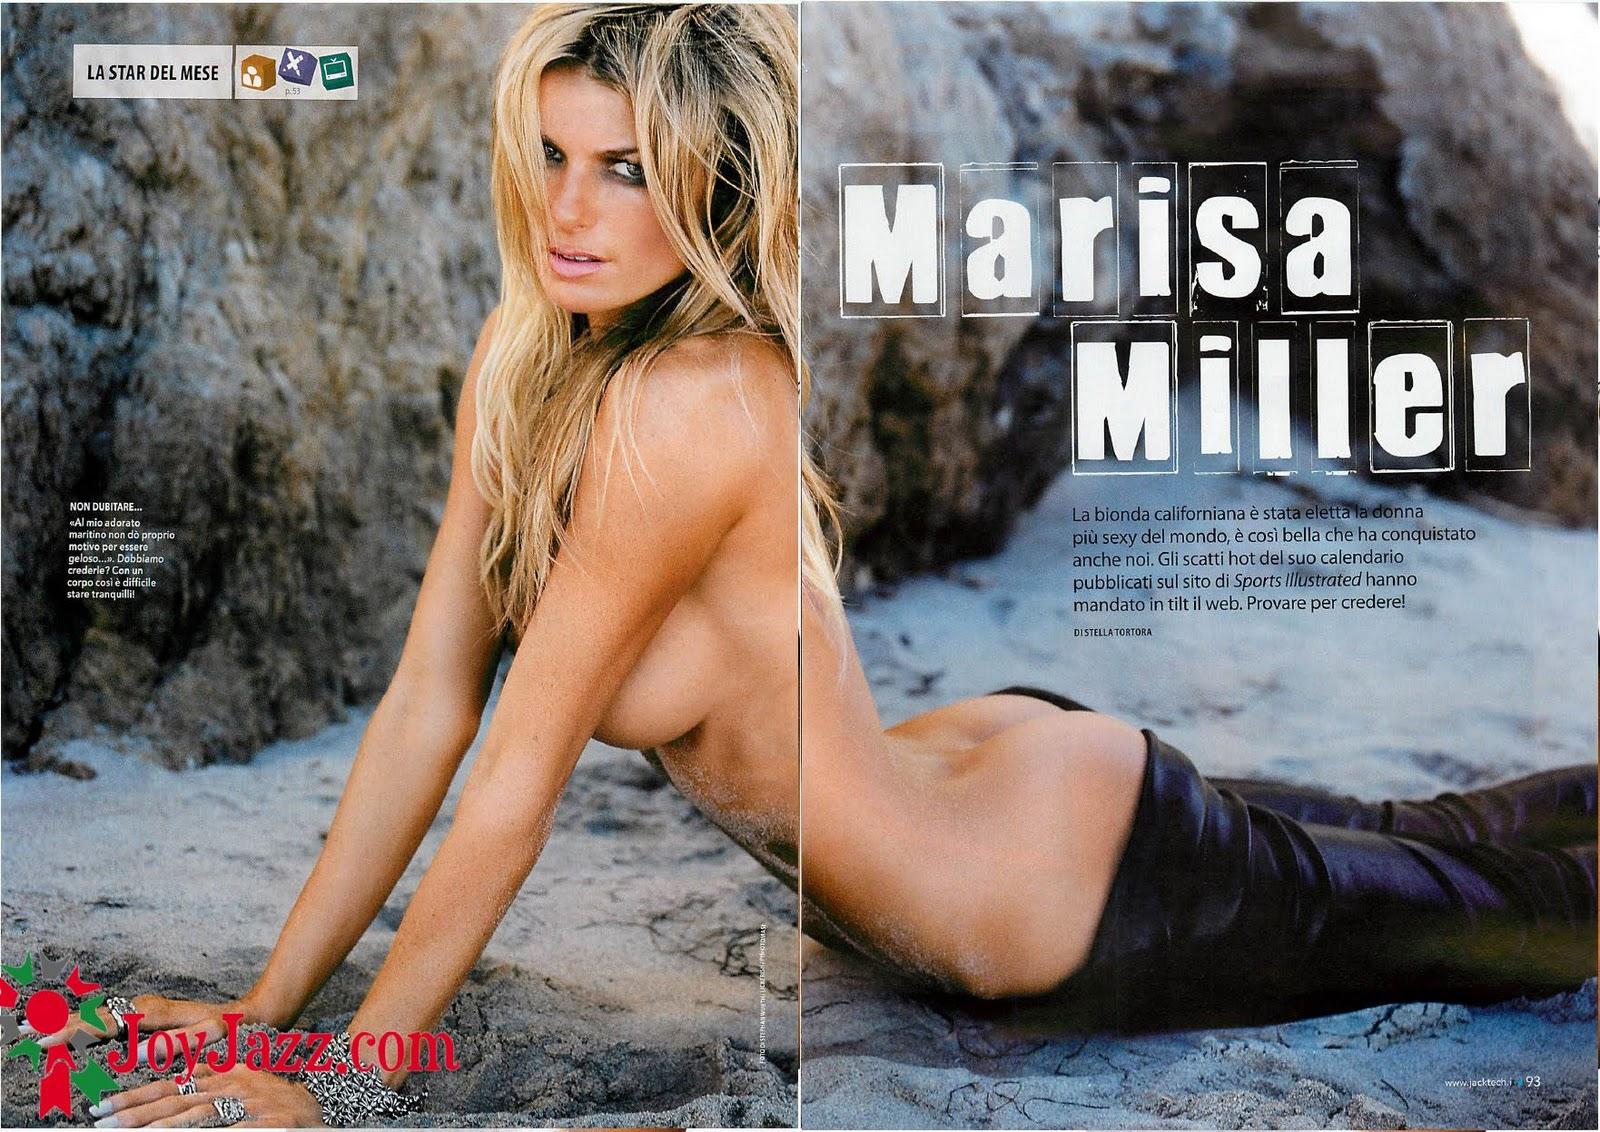 http://1.bp.blogspot.com/_0LdSrYkvVVk/TQecMQNVsDI/AAAAAAAABUk/9VqYCMYY_mc/s1600/Marissa-Miller-7.jpg